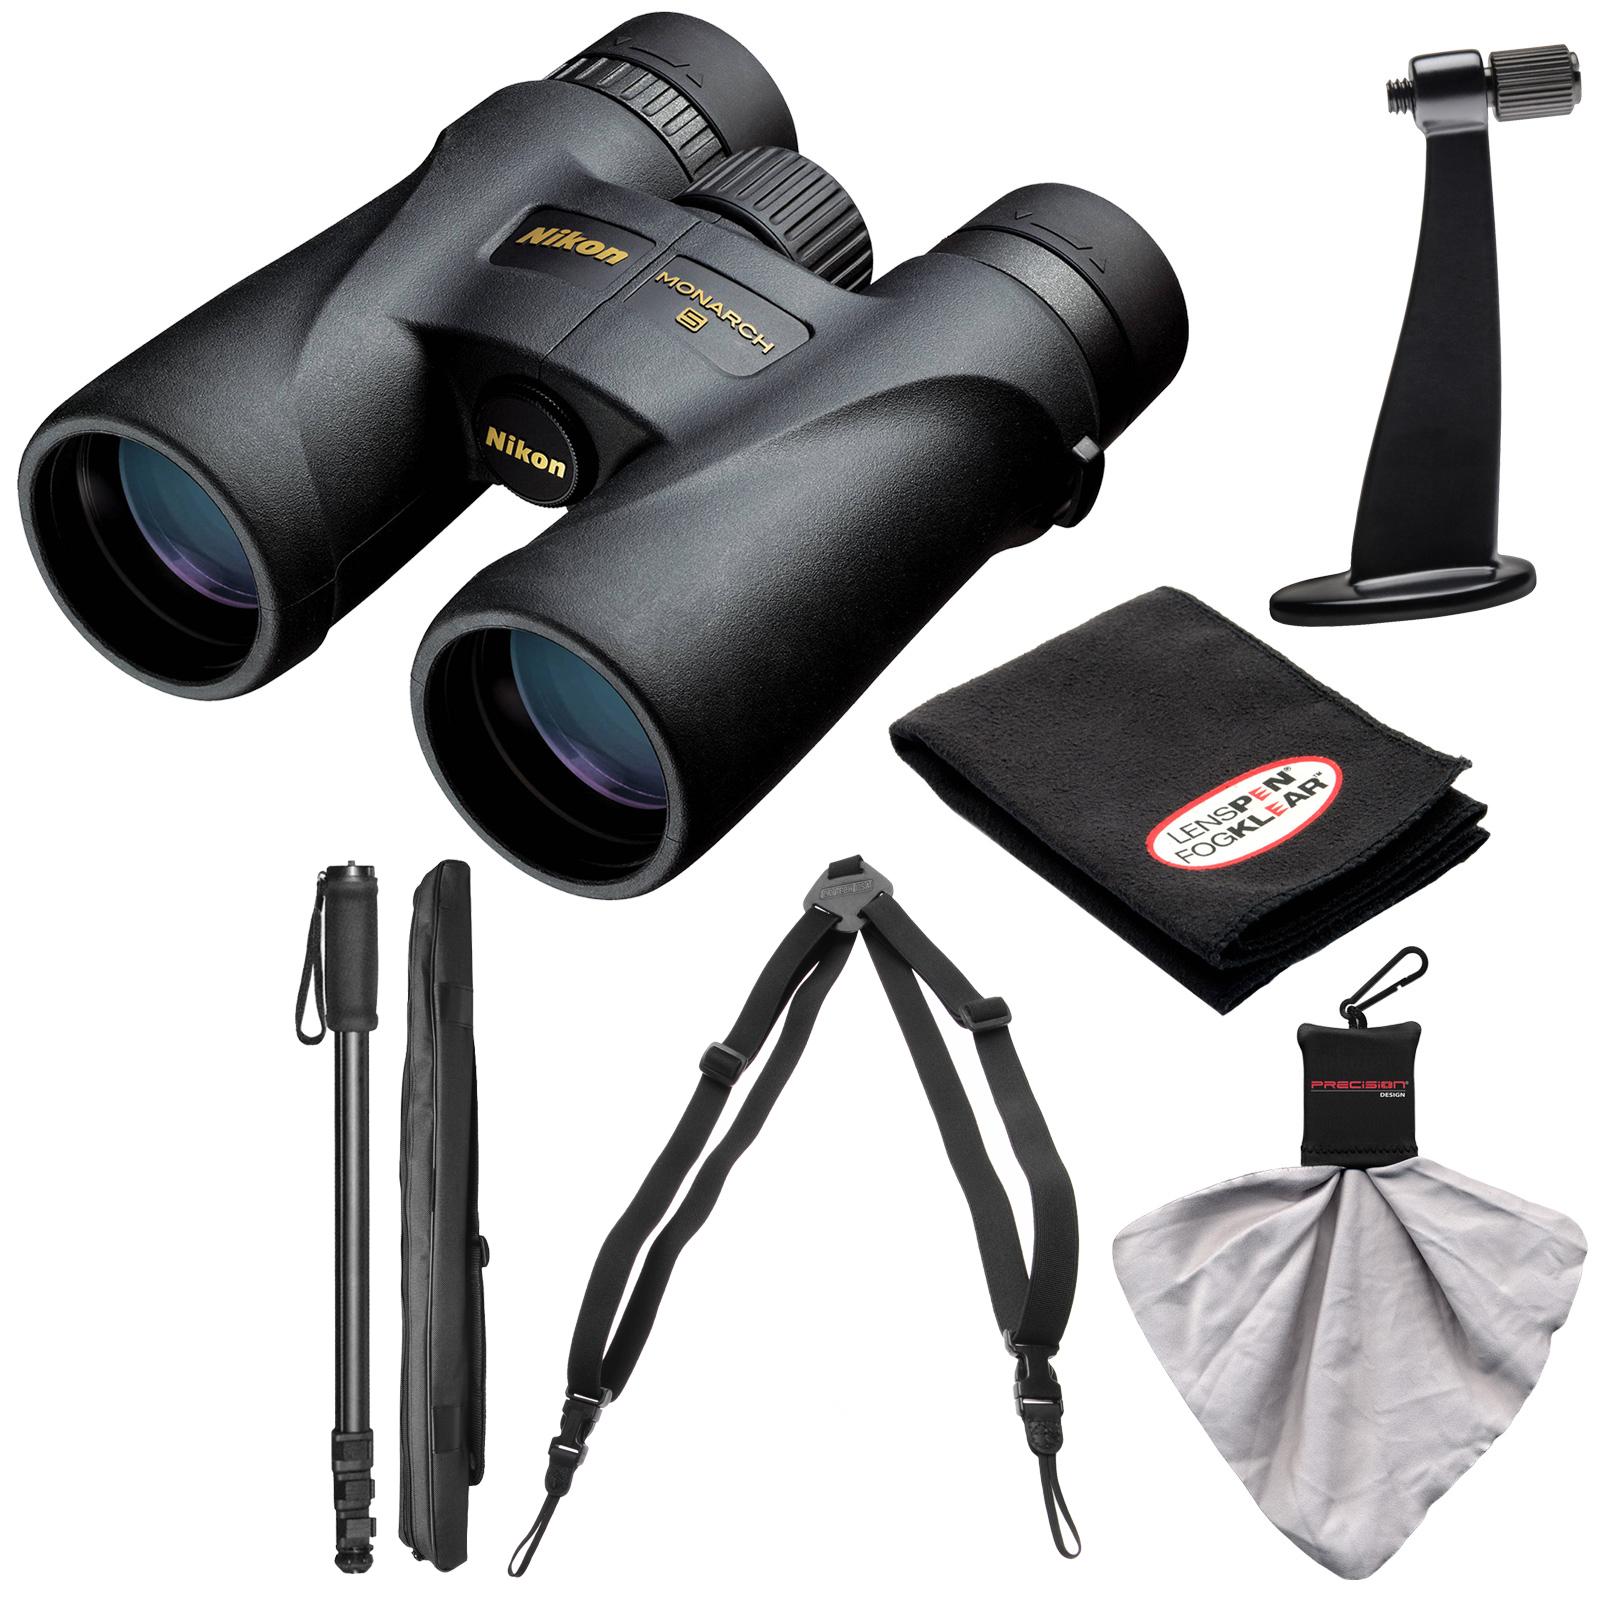 Nikon Monarch 5 10x42 ED ATB Waterproof/Fogproof Binoculars with Case + Harness + Tripod Adapter & Monopod + Kit